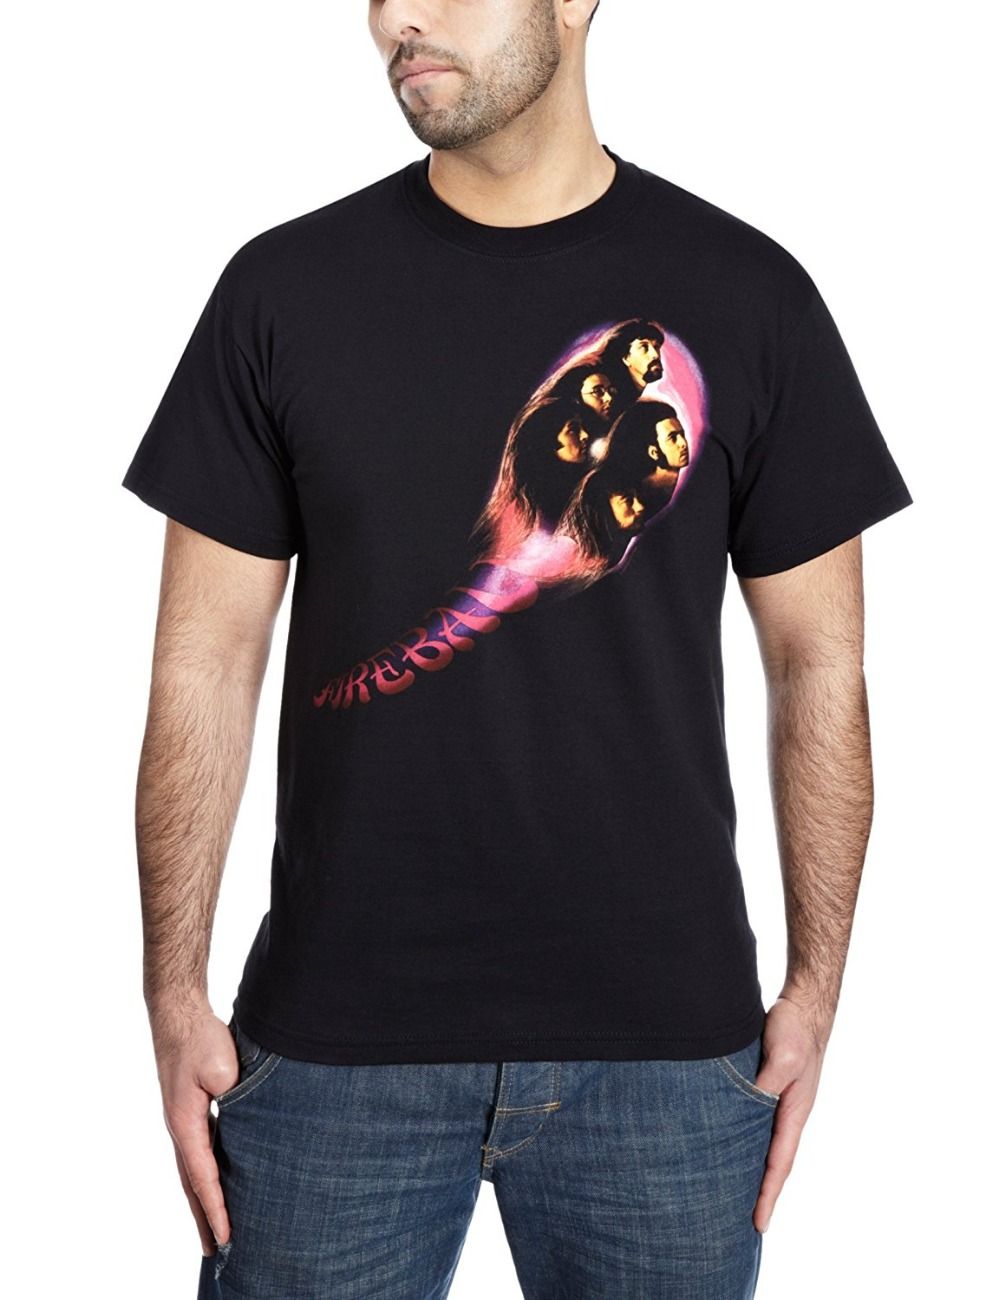 Short Sleeve Cotton T Shirts Man Clothing Deep Purple Fireball Official Mens T-Shirt Printed Pure Cotton Mens